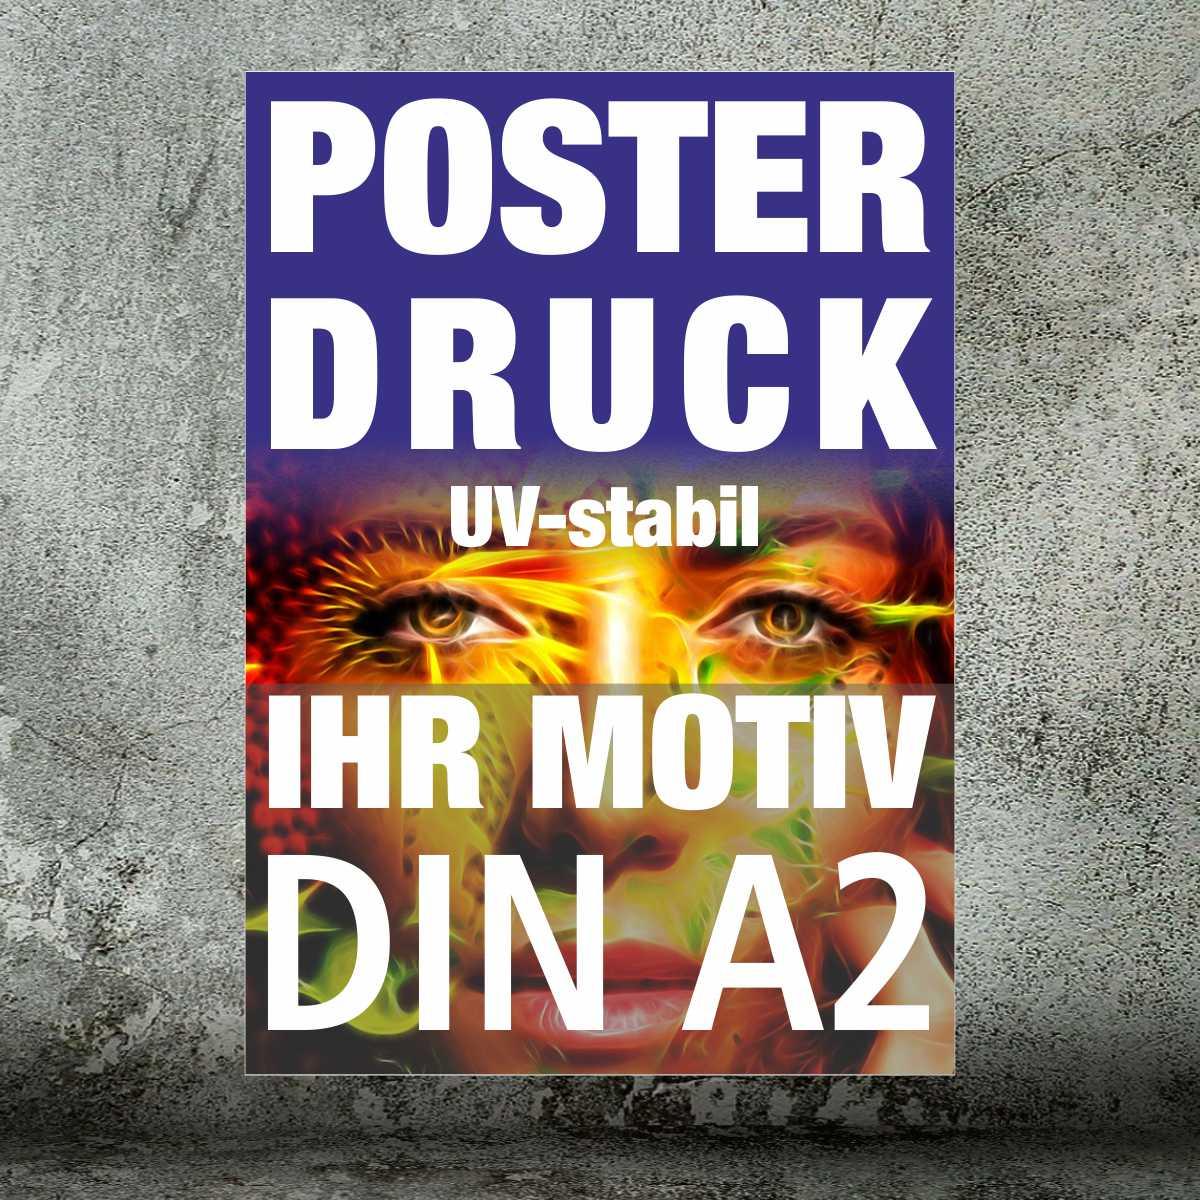 Plakate und Poster · DIN A2 4/0-farbig (ab 1 Stück)